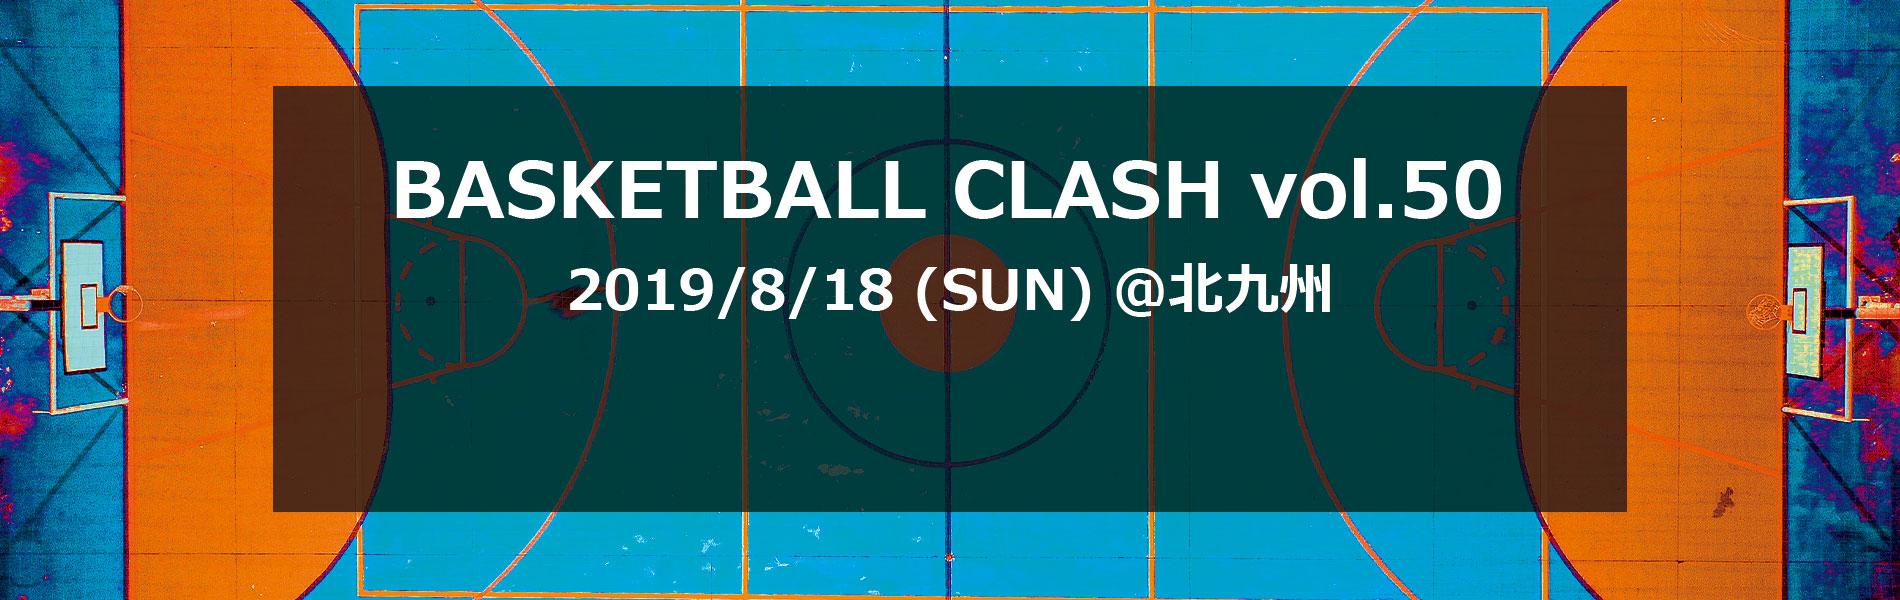 basketball clash 50